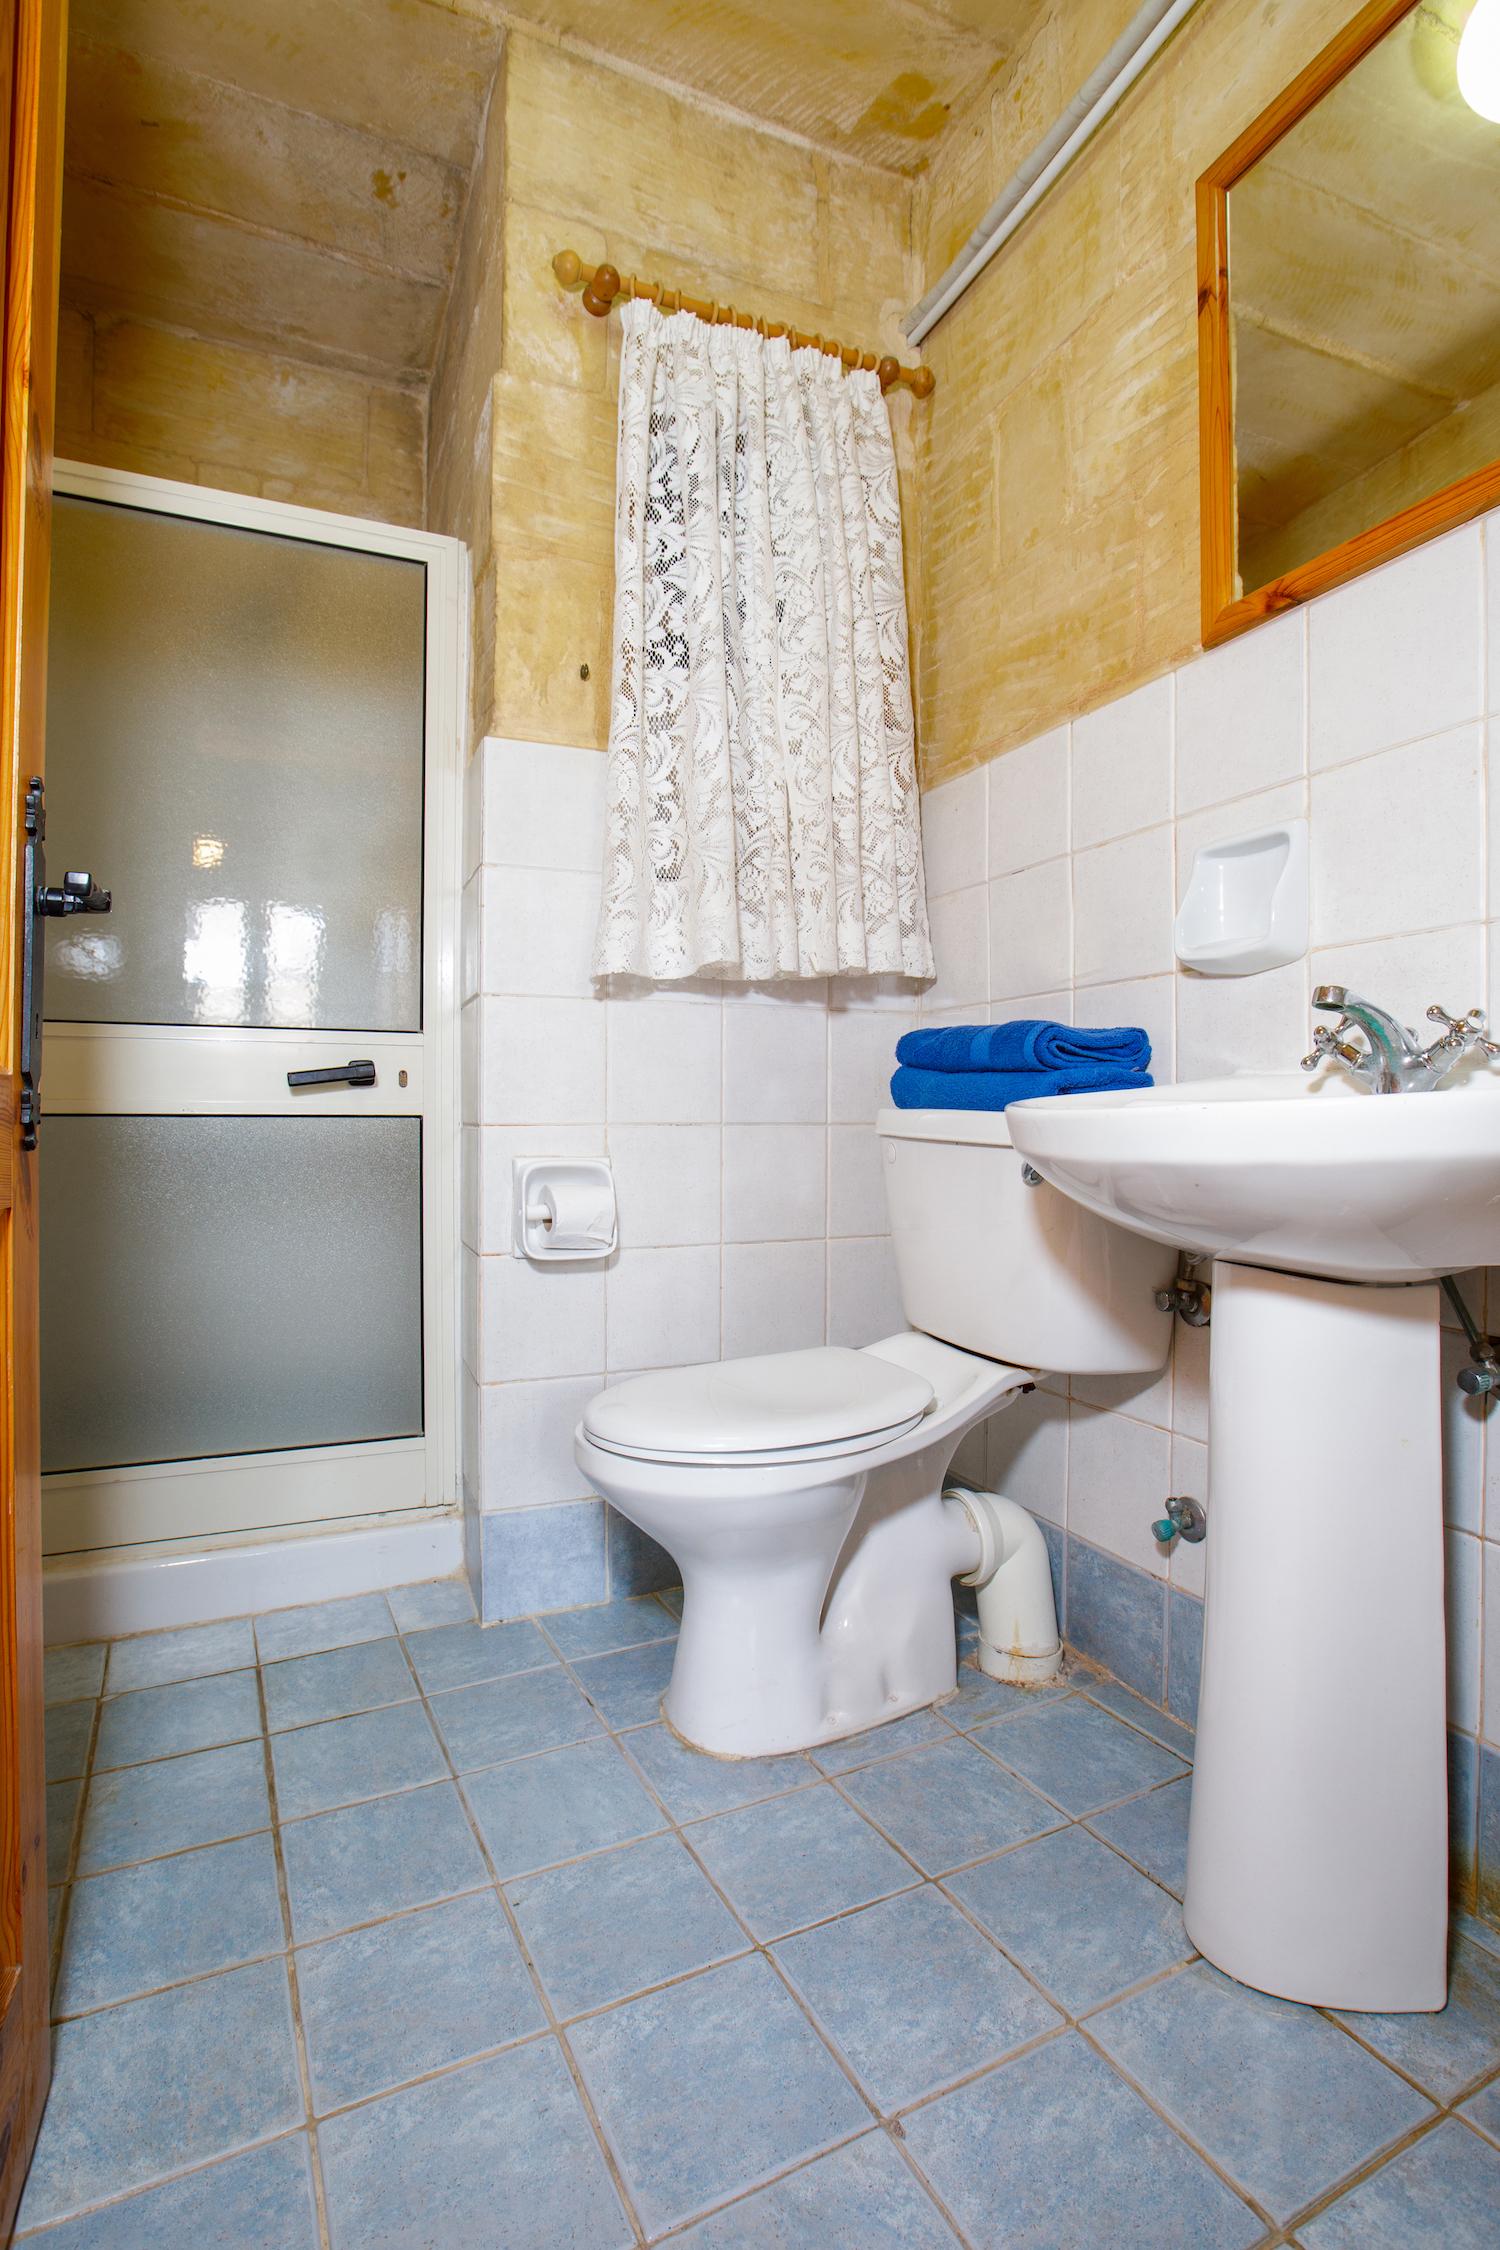 The ensuite bathroom + shower